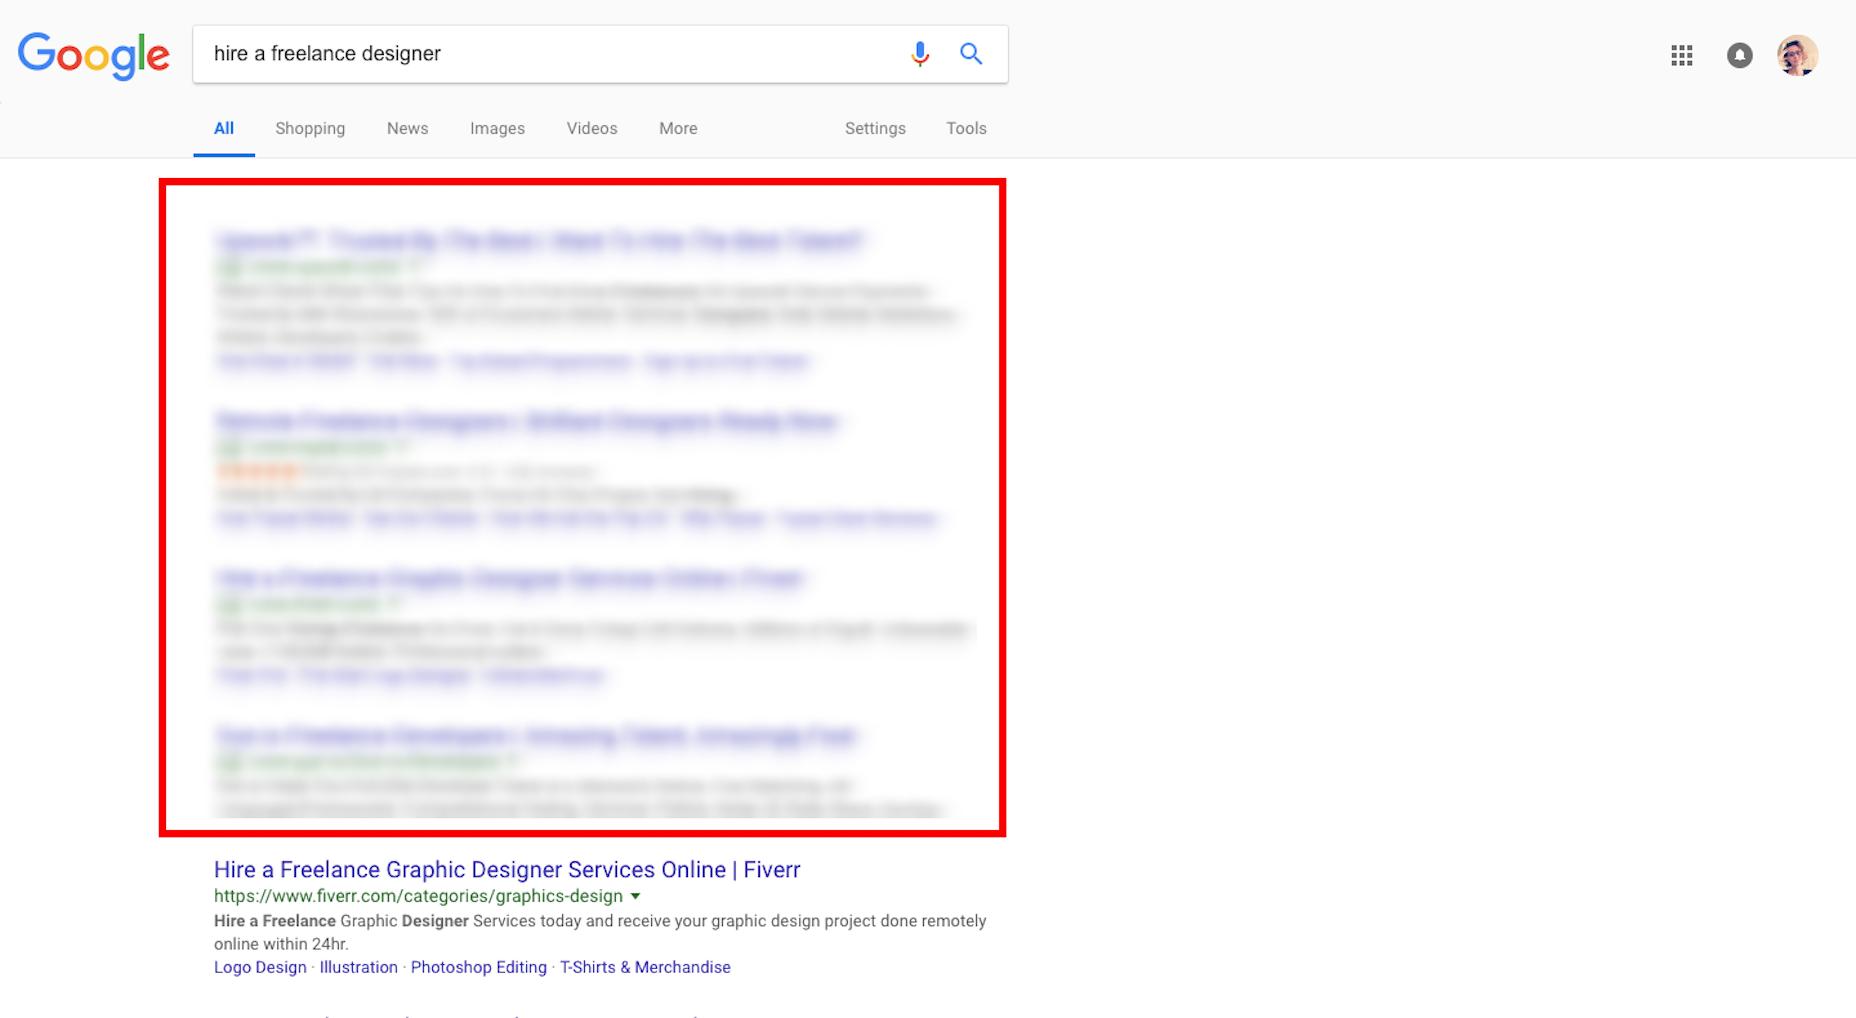 Listados de búsqueda orgánica